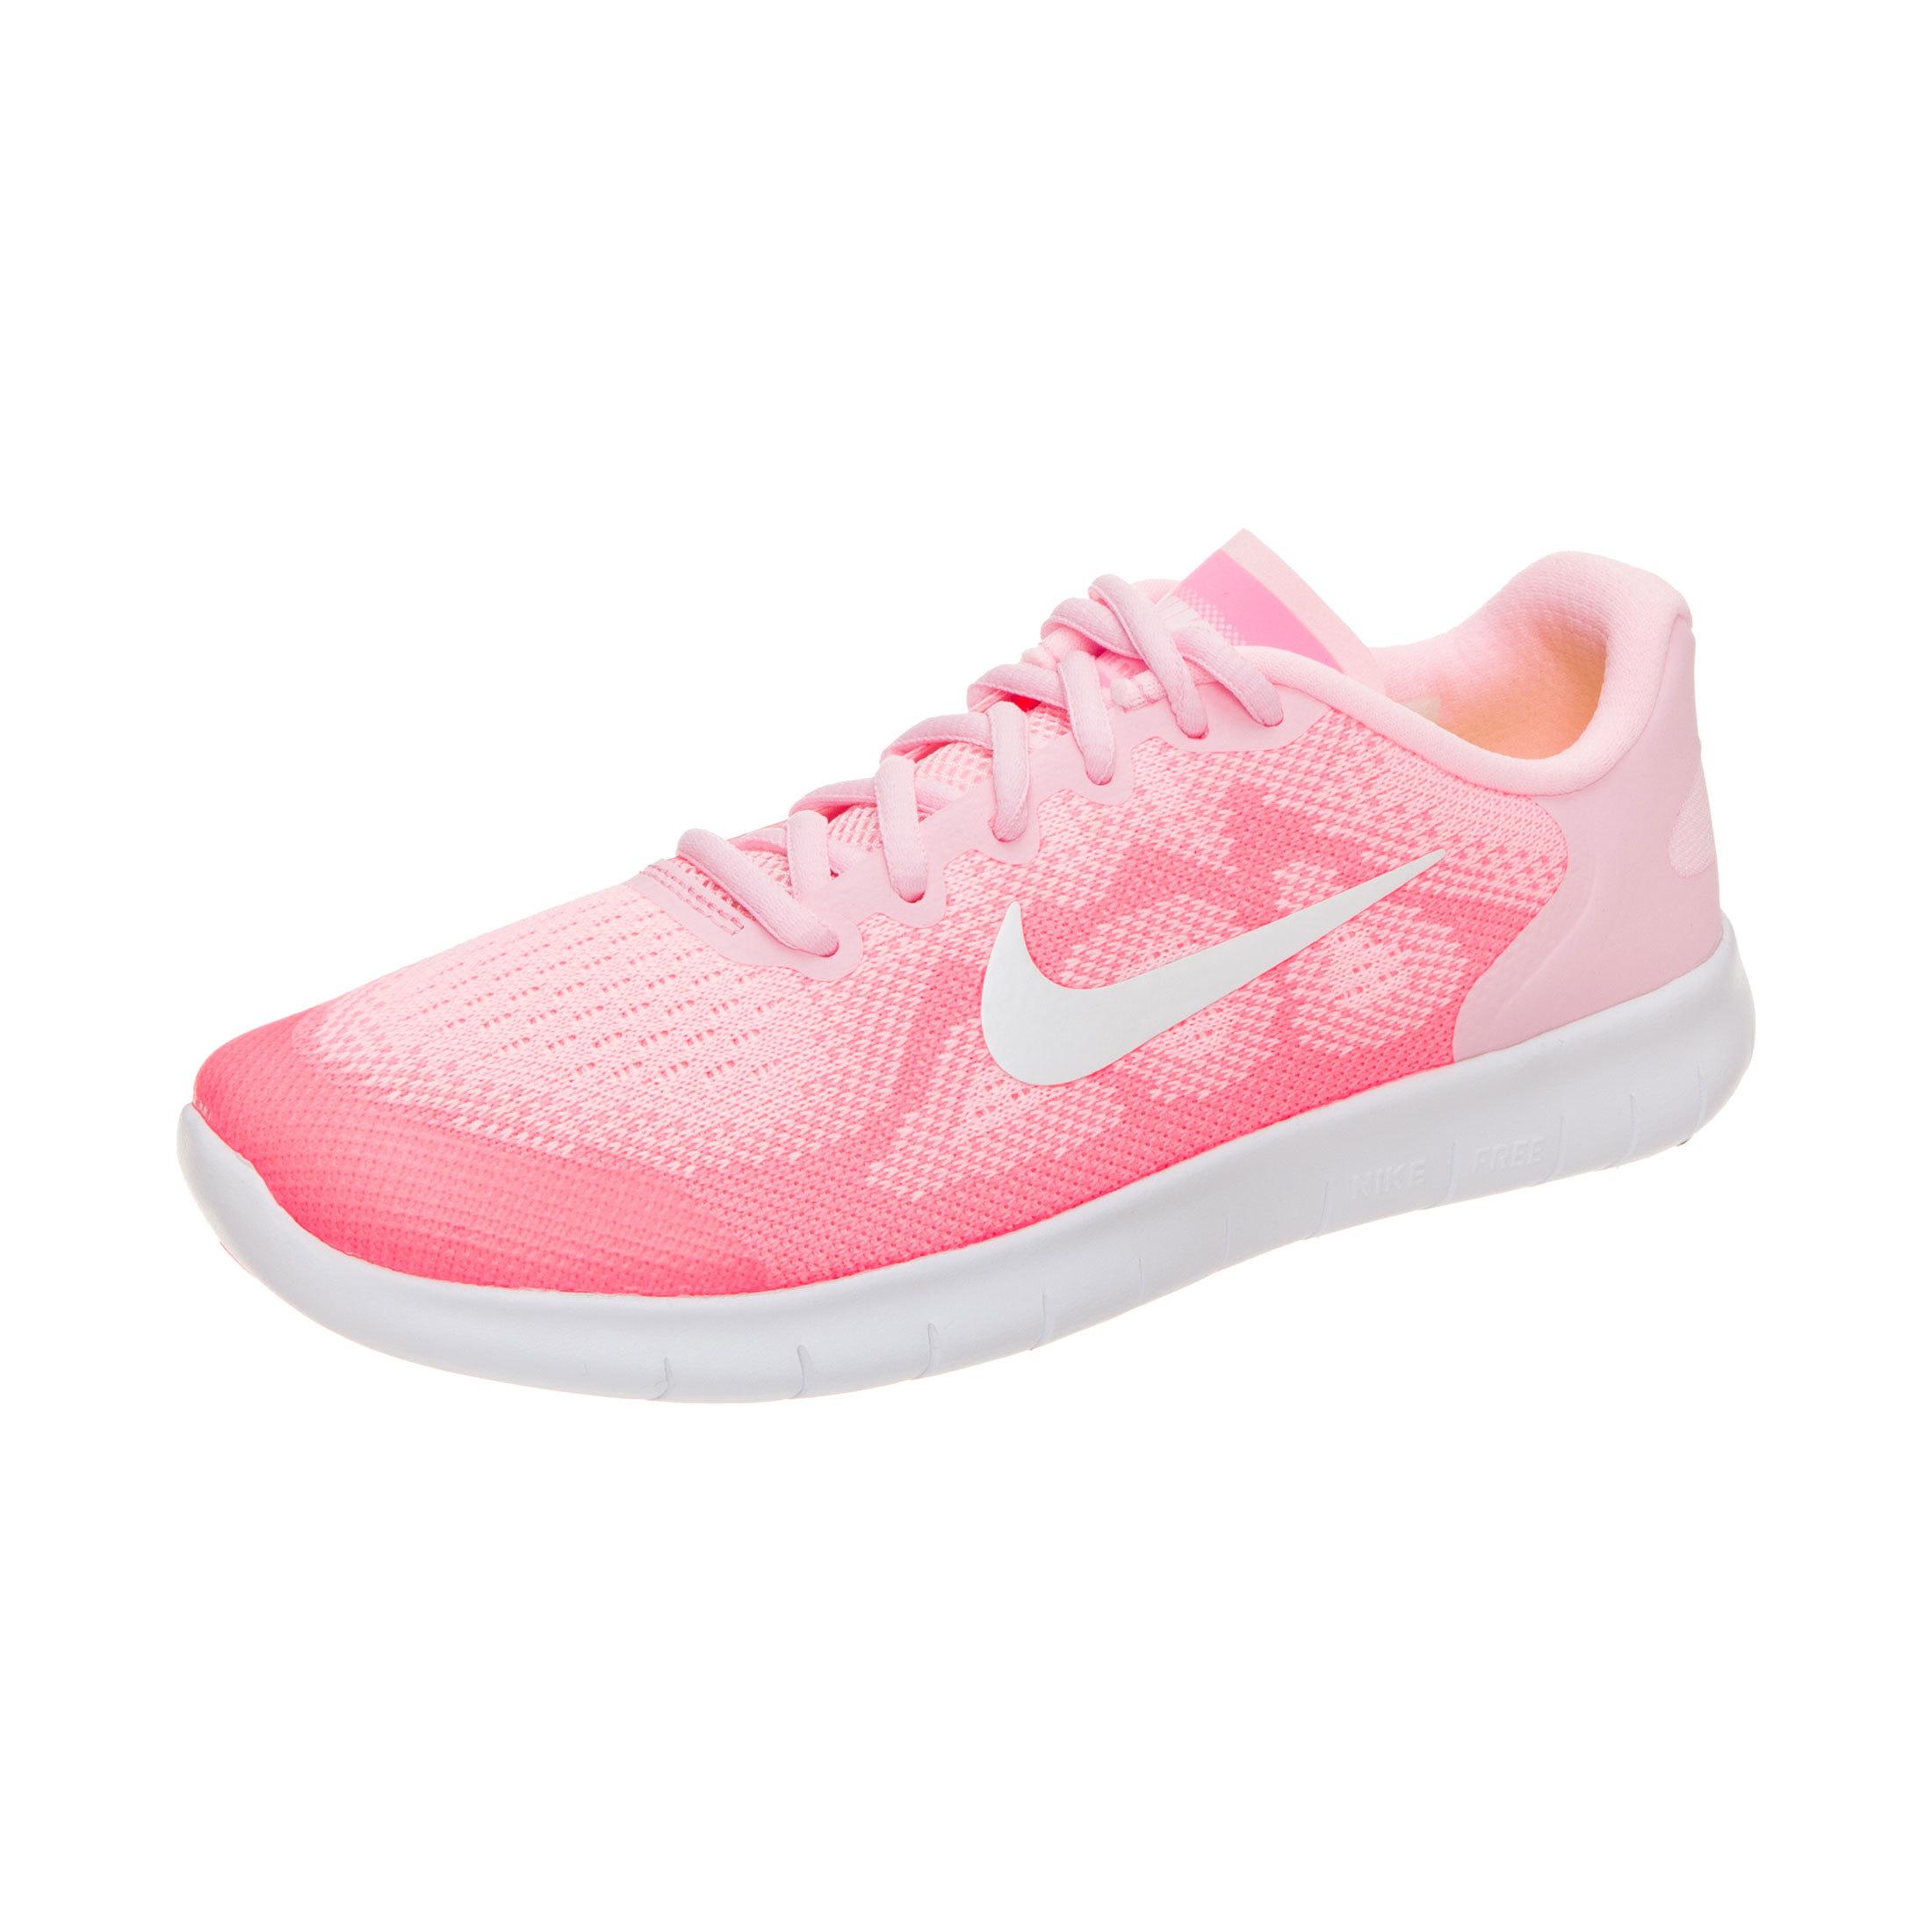 cheaper 45d73 d30ab Nike Free RN 2017 Older Kids'Running Shoe - Pink